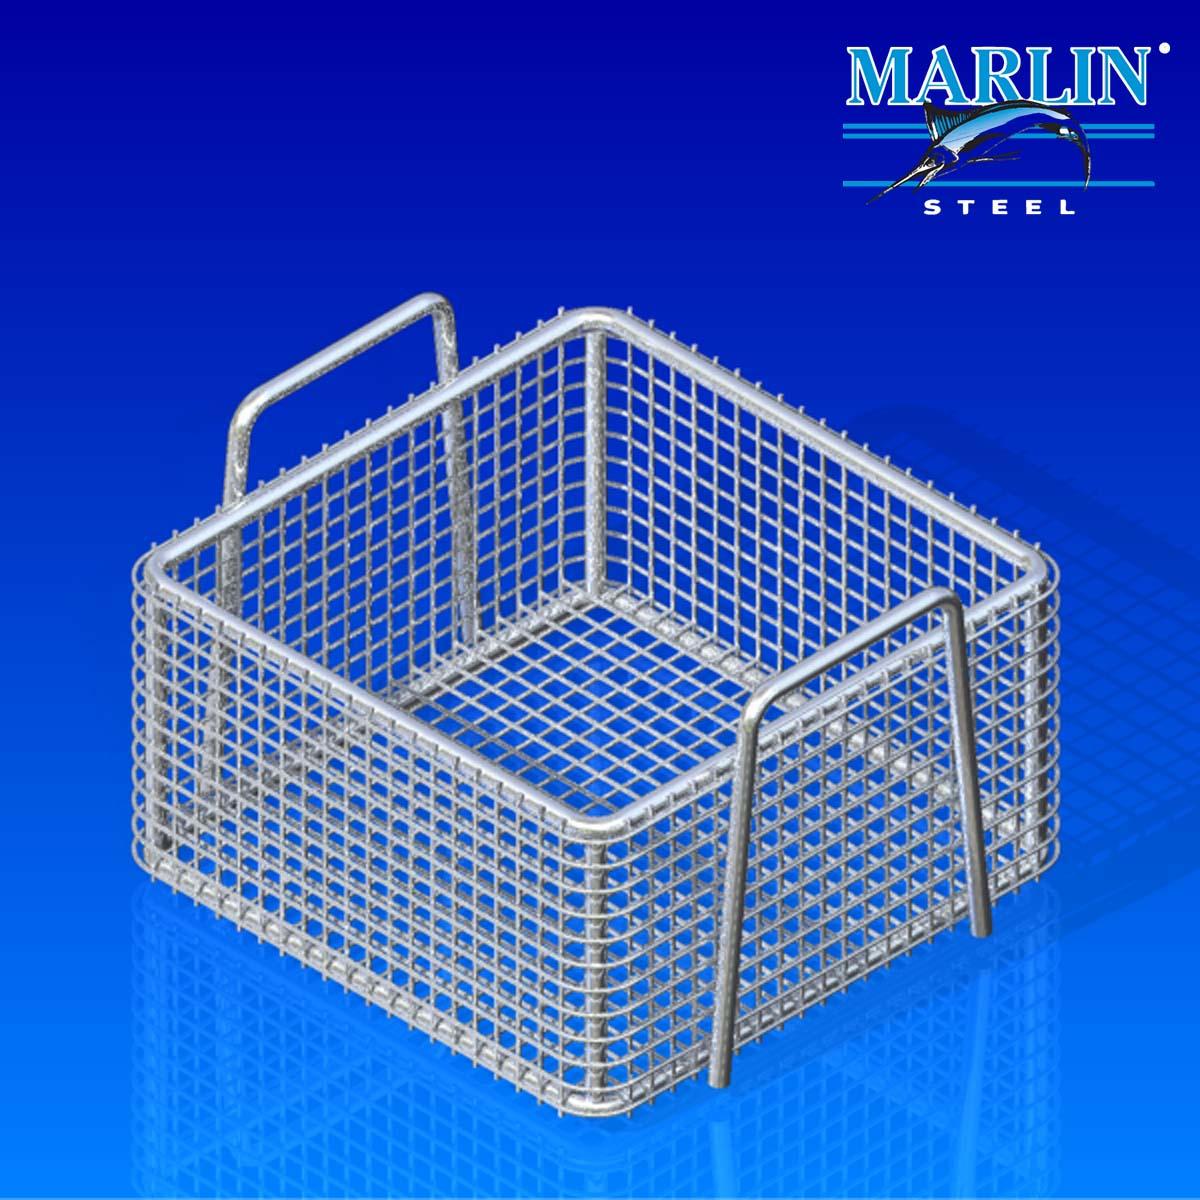 Marlin Steel Basket with Handles 404008